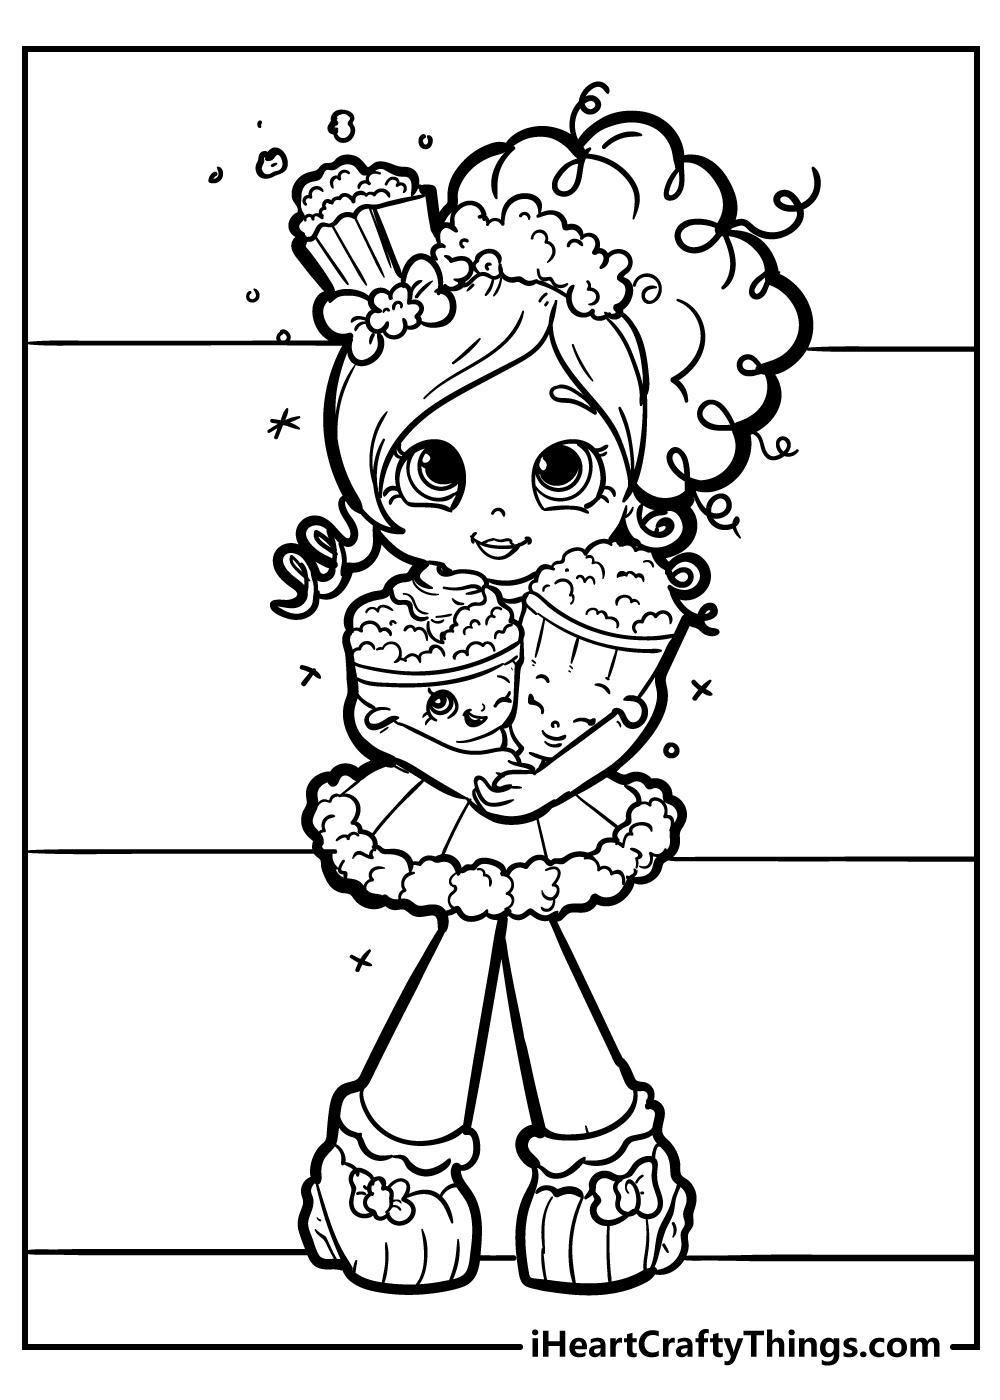 popette shopkins coloring book free printable